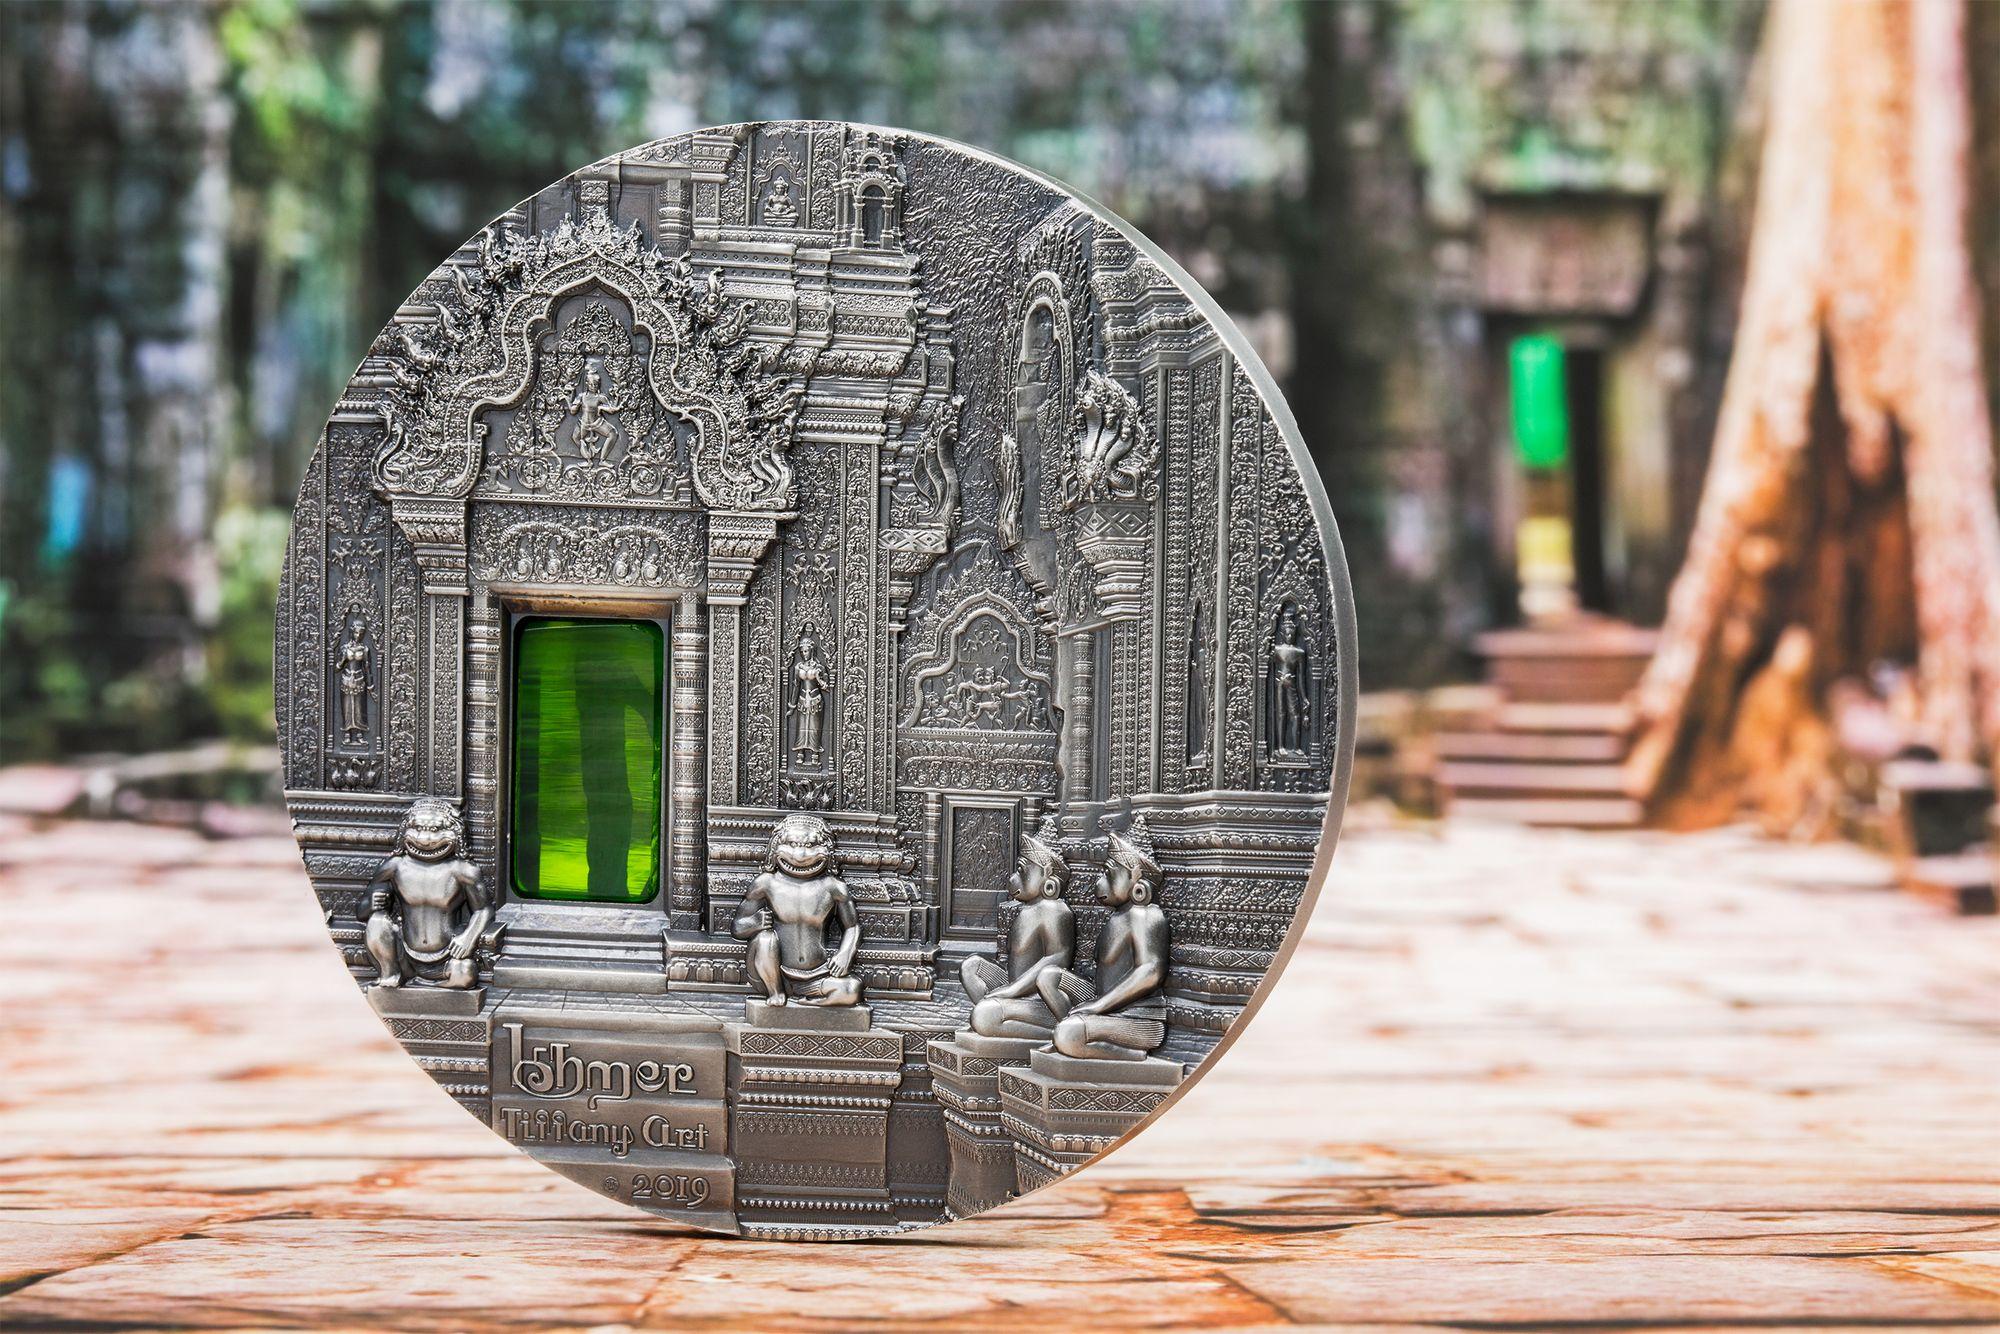 2019 Tiffany Art Khmer 2oz Silver Coin